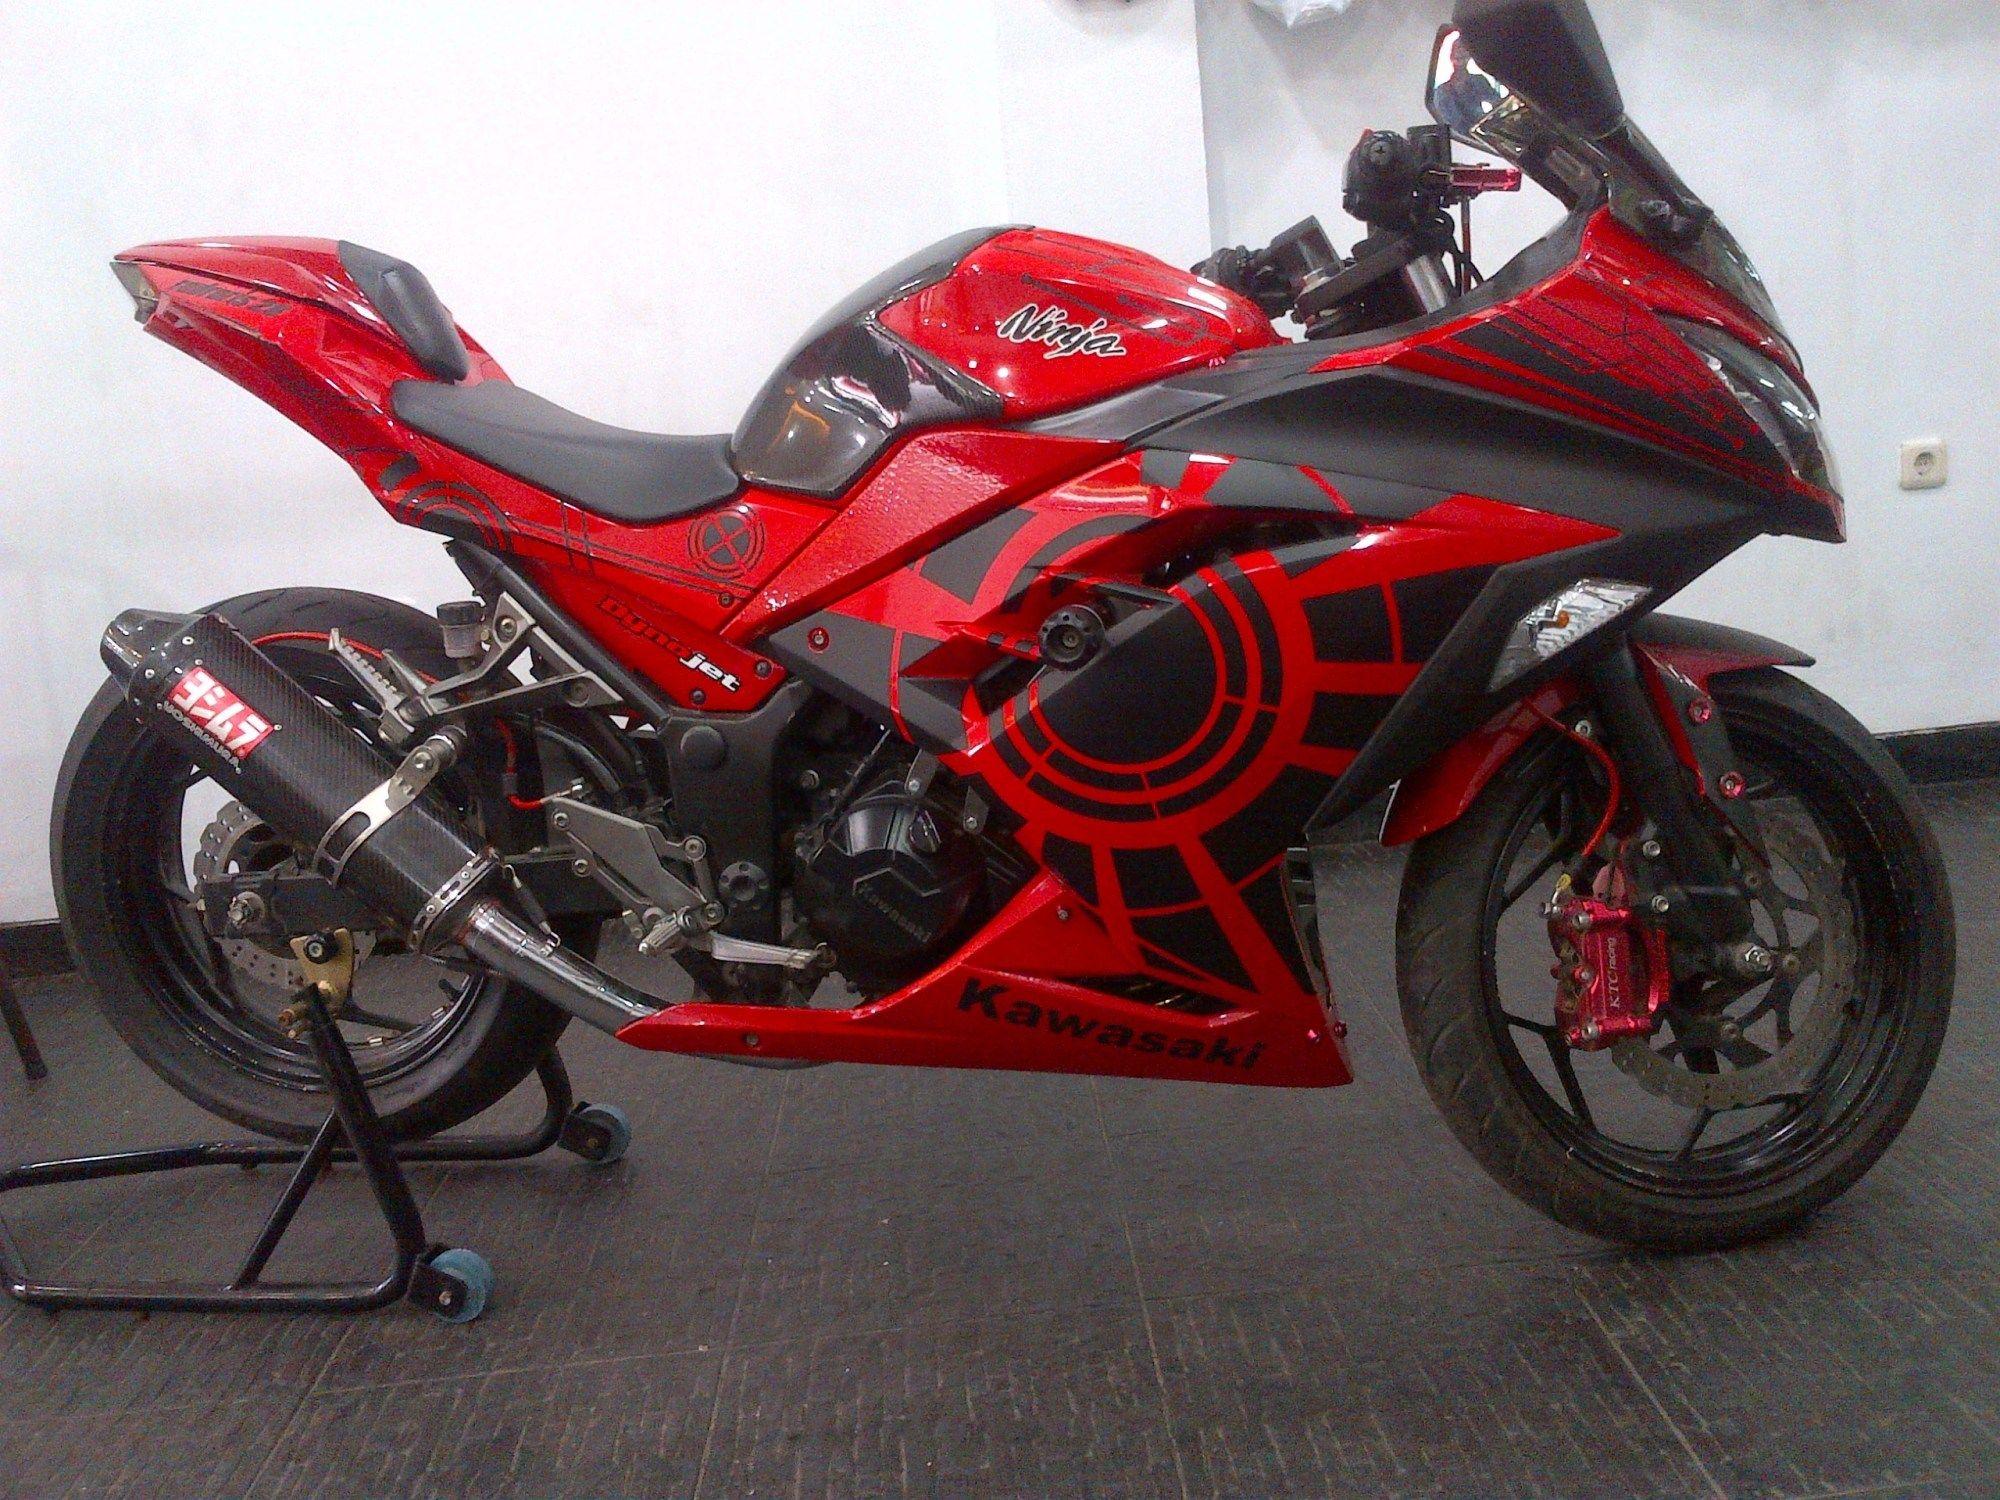 modif kawasaki ninja 150 rr velg 17 jari-jari | modifikasi motor